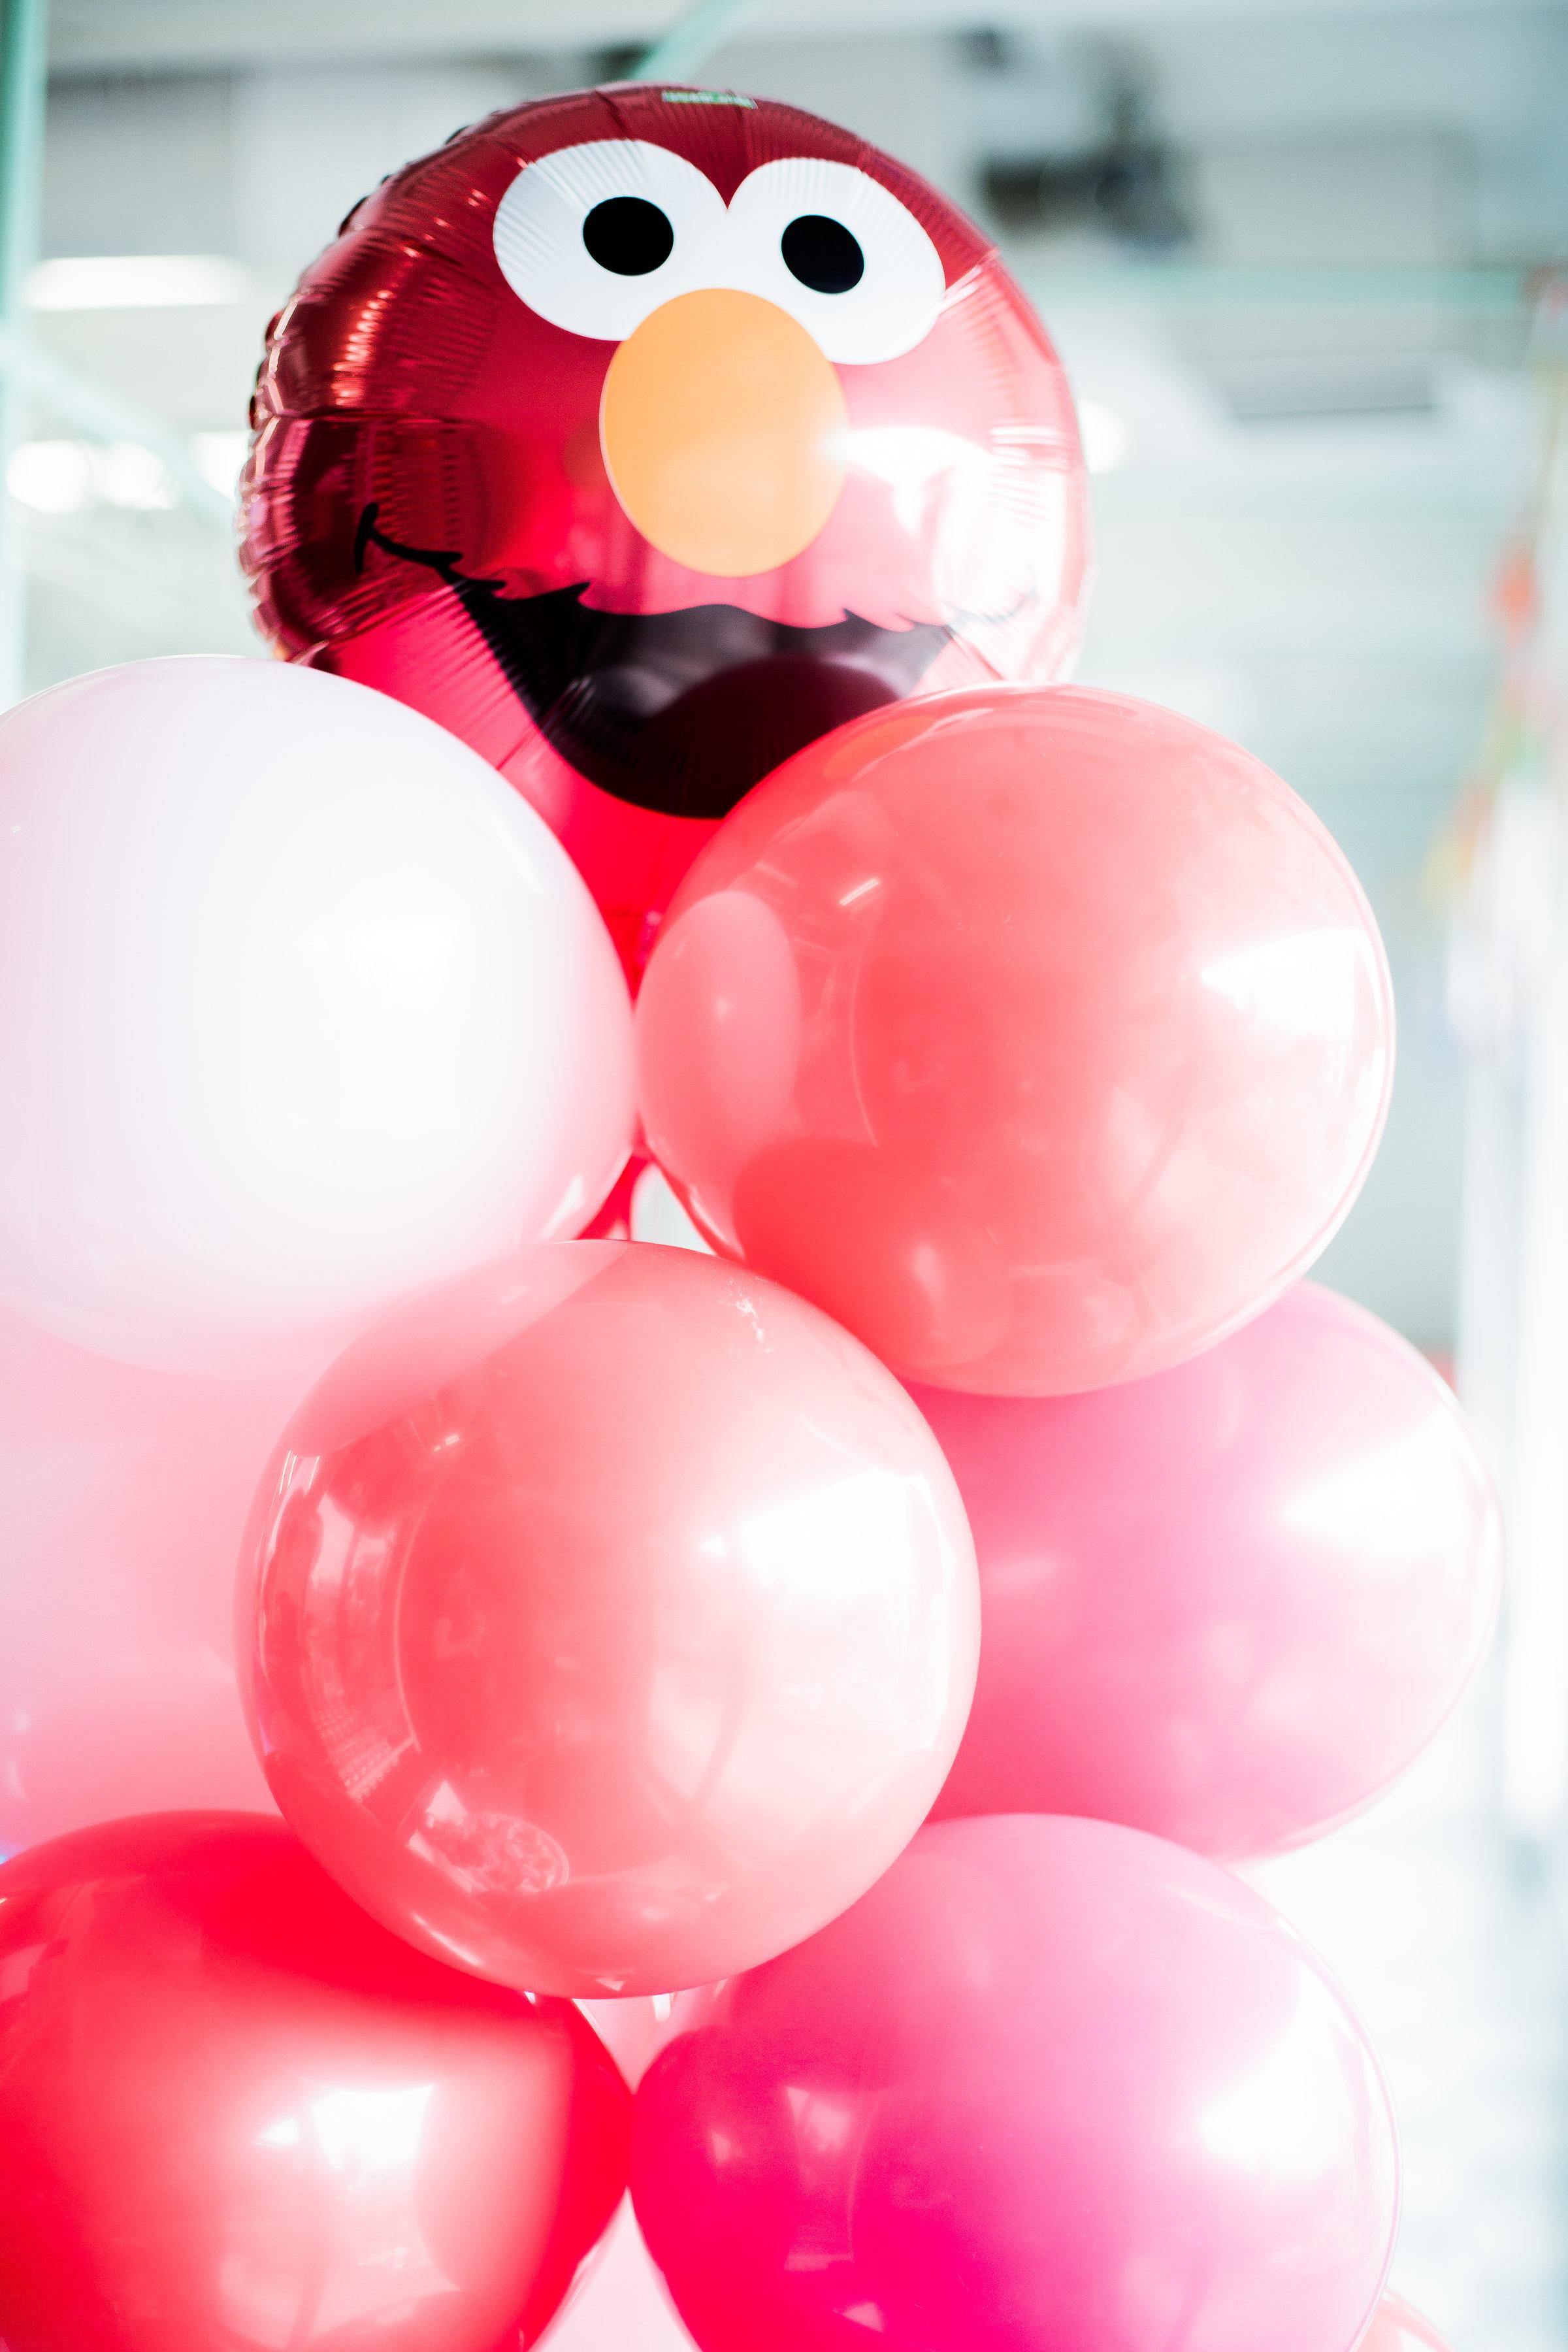 Alexis'_1st_Birthday_04.07.18_-149.jpg